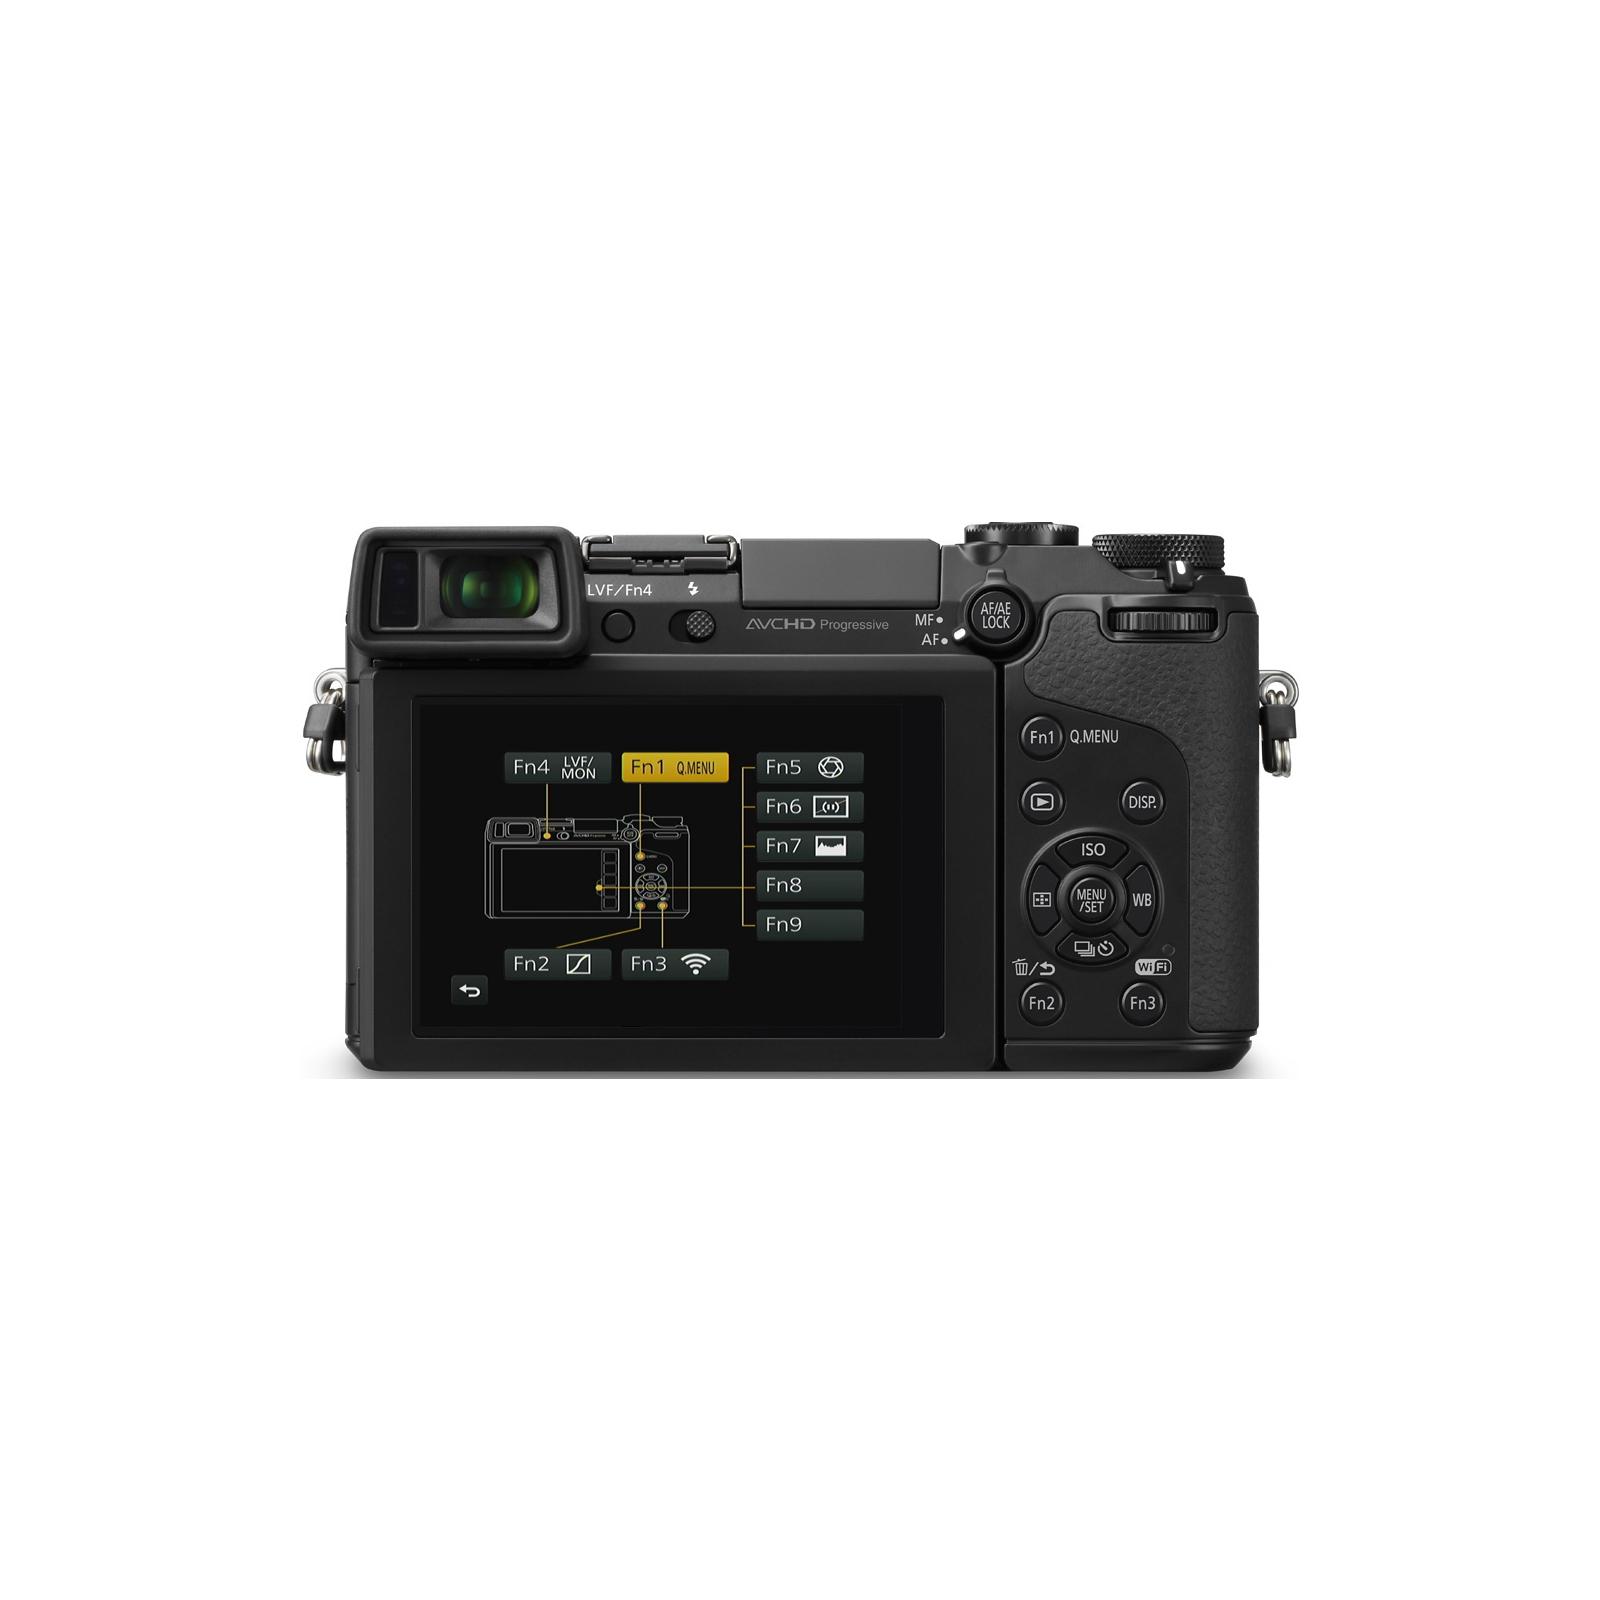 Цифровой фотоаппарат PANASONIC DMC-GX7 Body (DMC-GX7EE-K) изображение 2